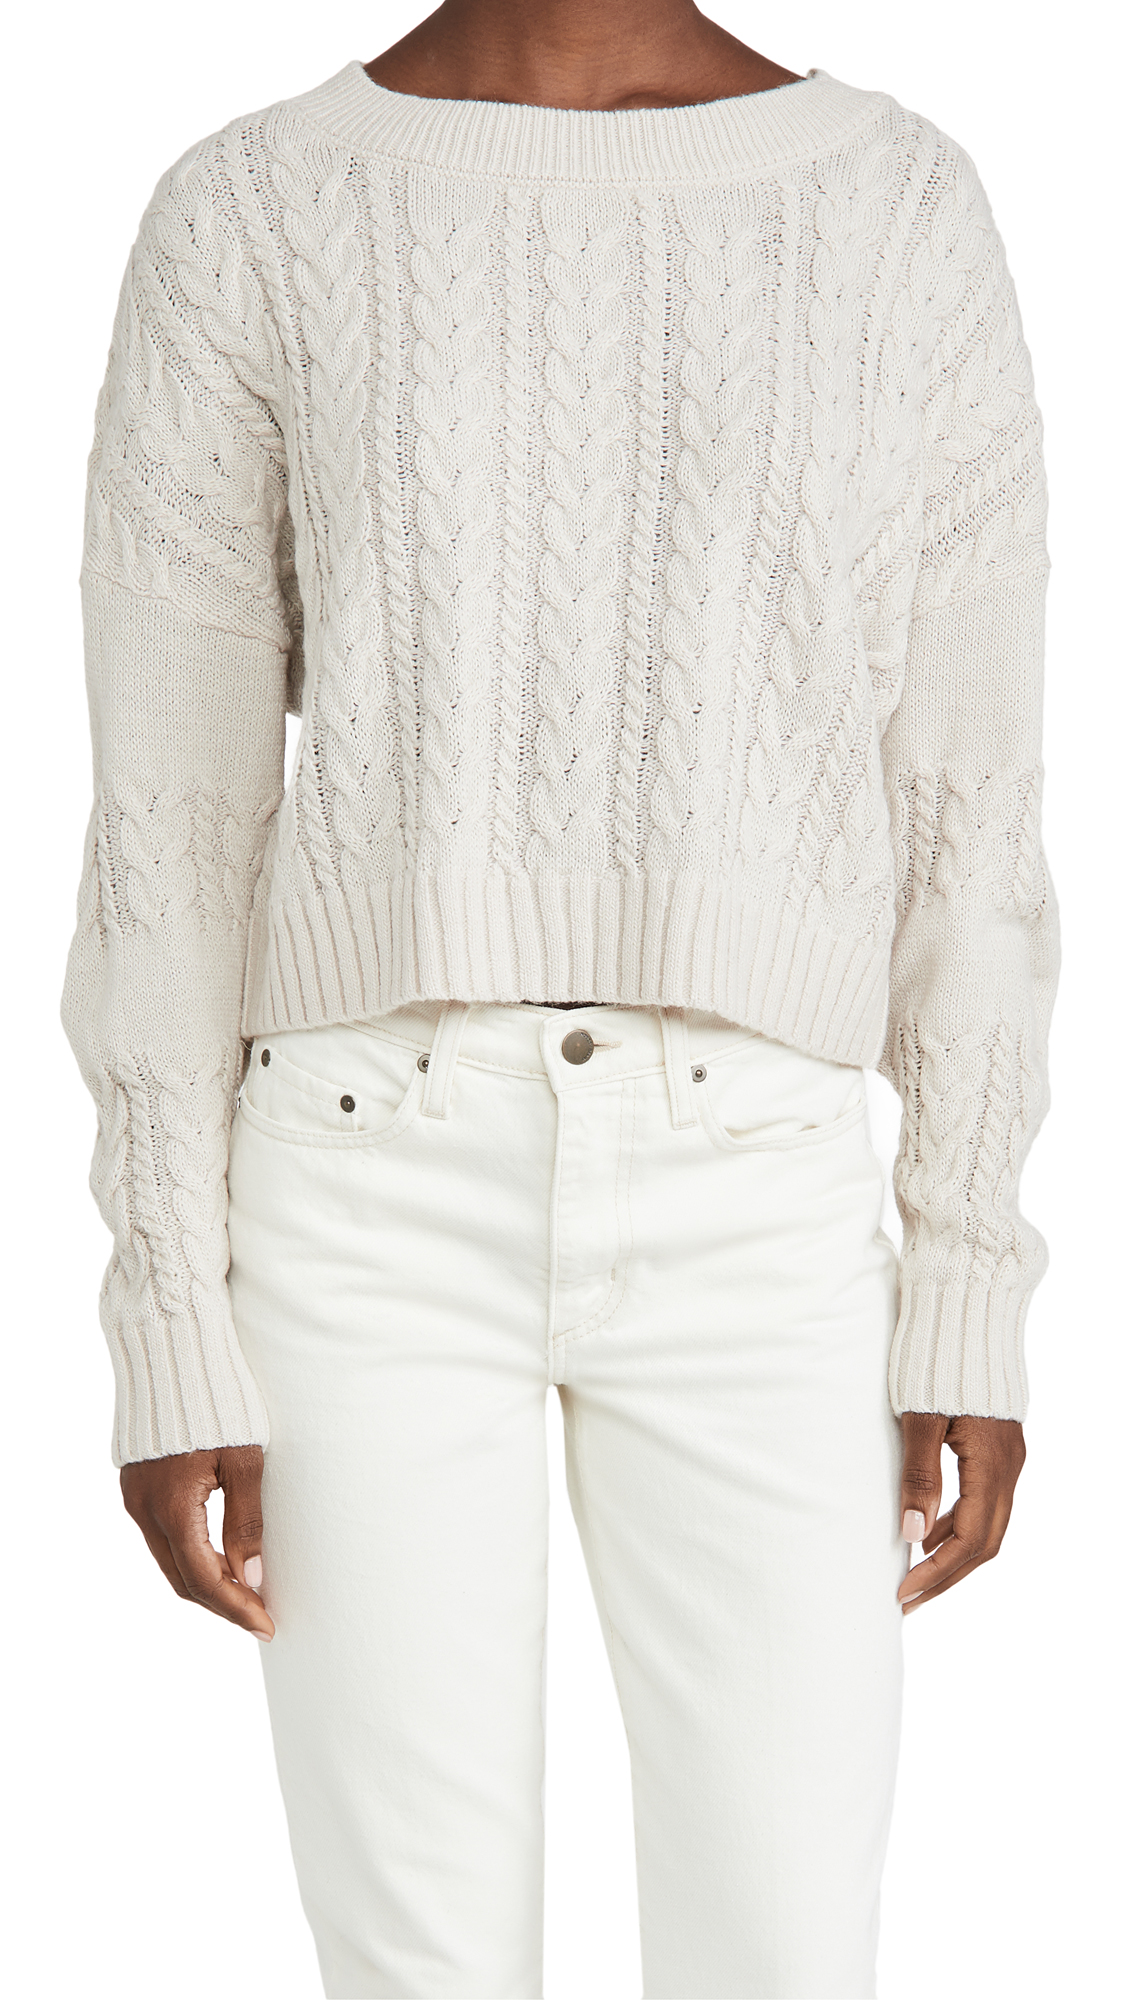 BB Dakota Isn't She Cute Cable Knit Crop Sweater